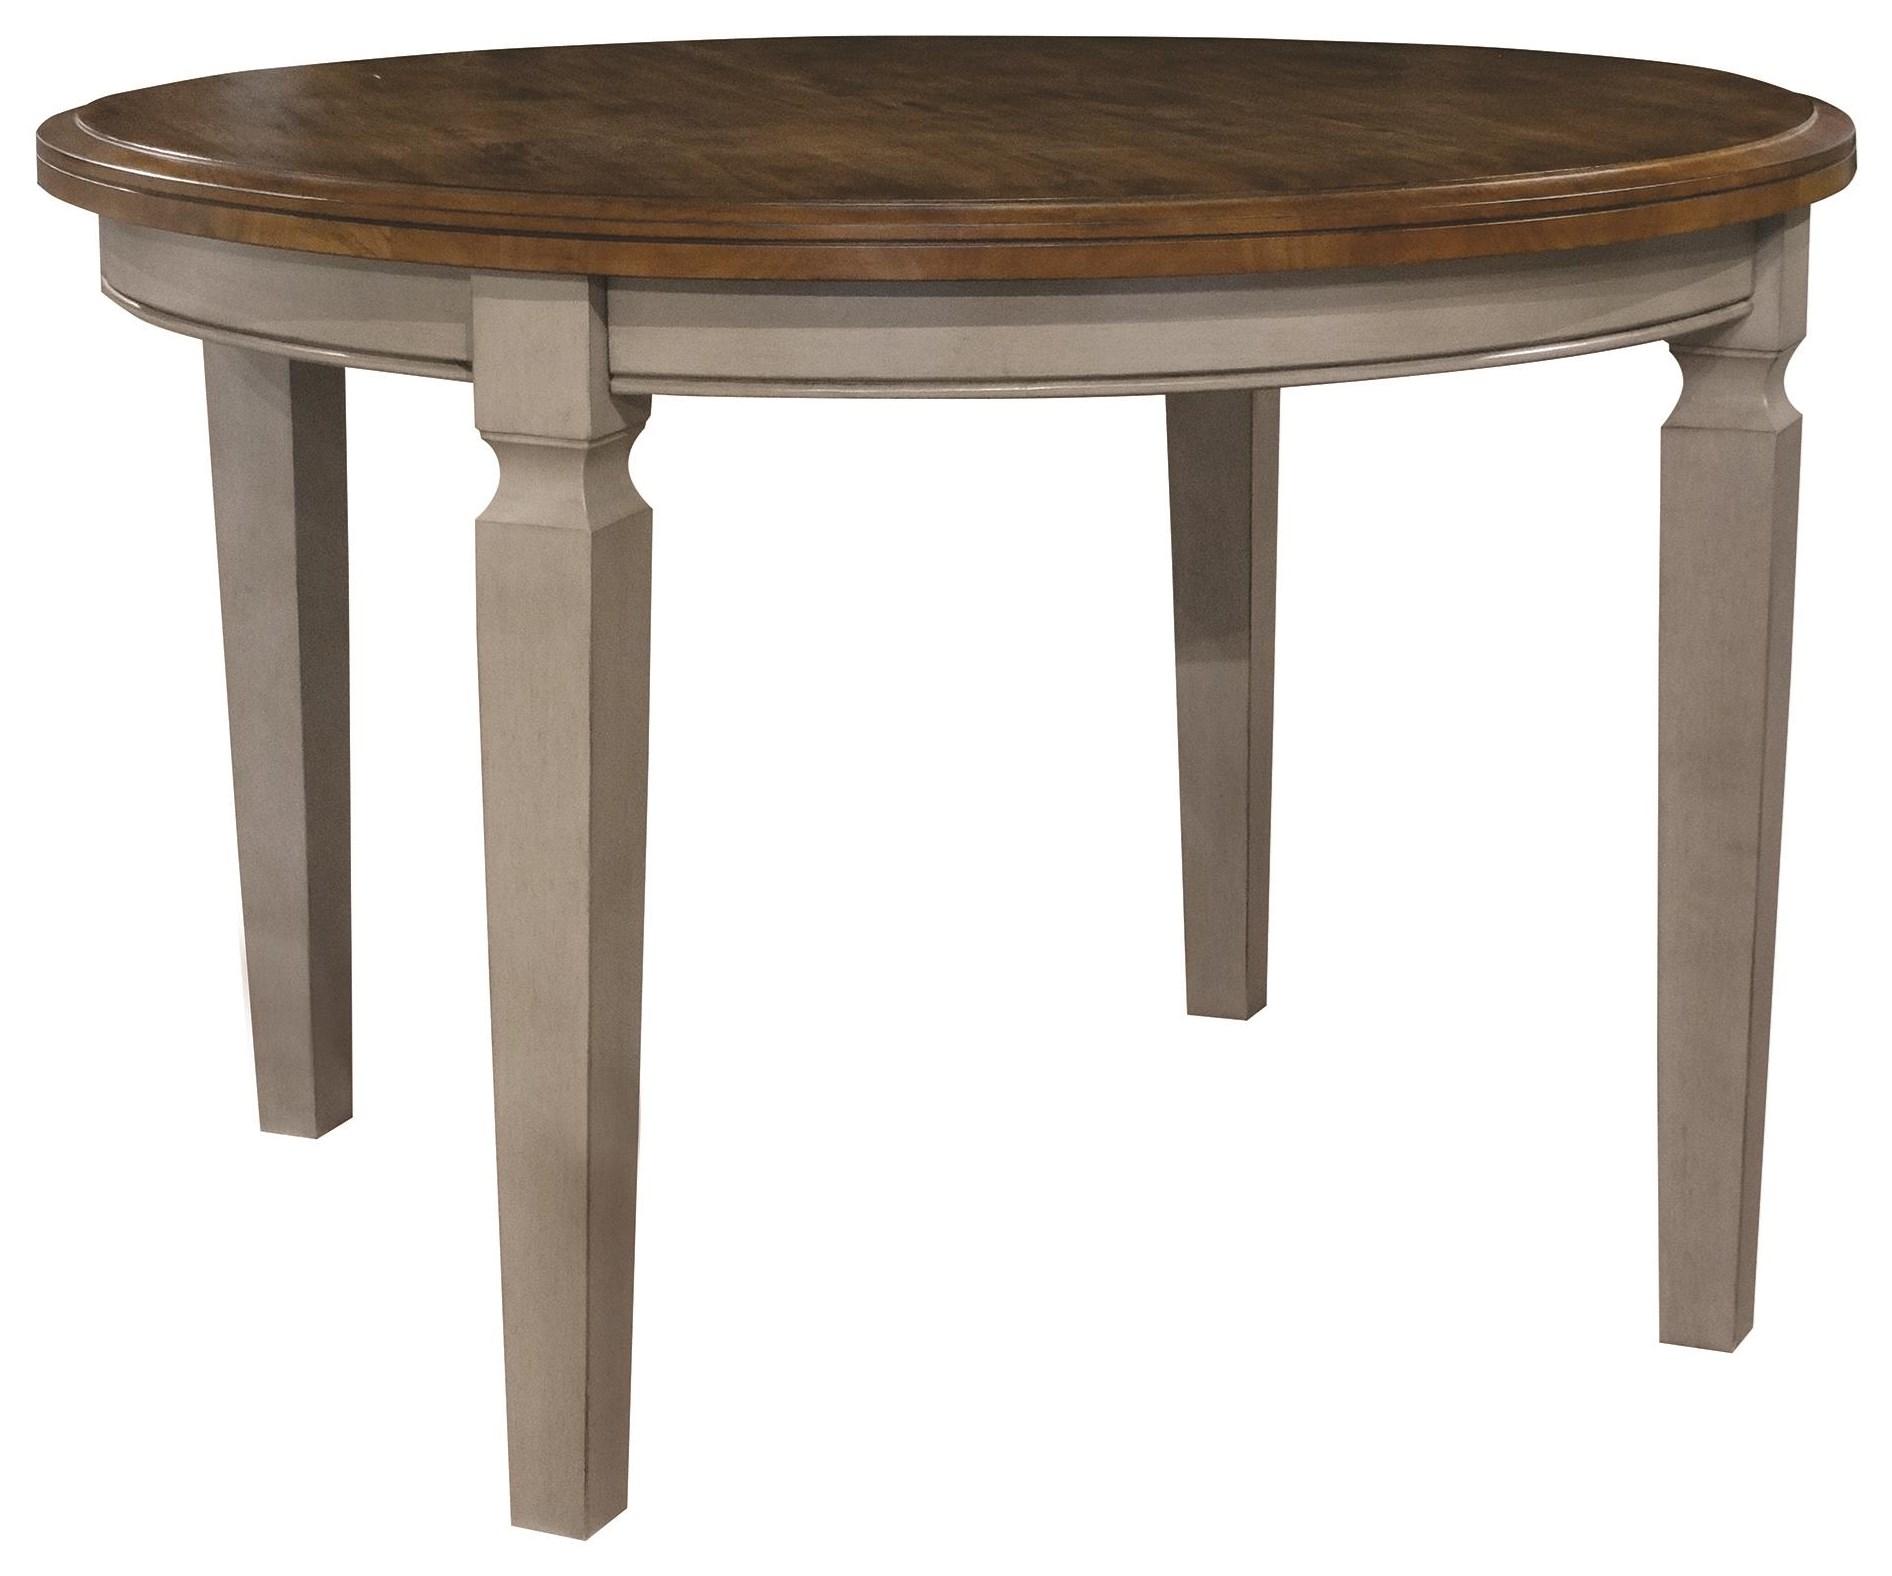 Vista Dining Table by John Thomas at Belfort Furniture